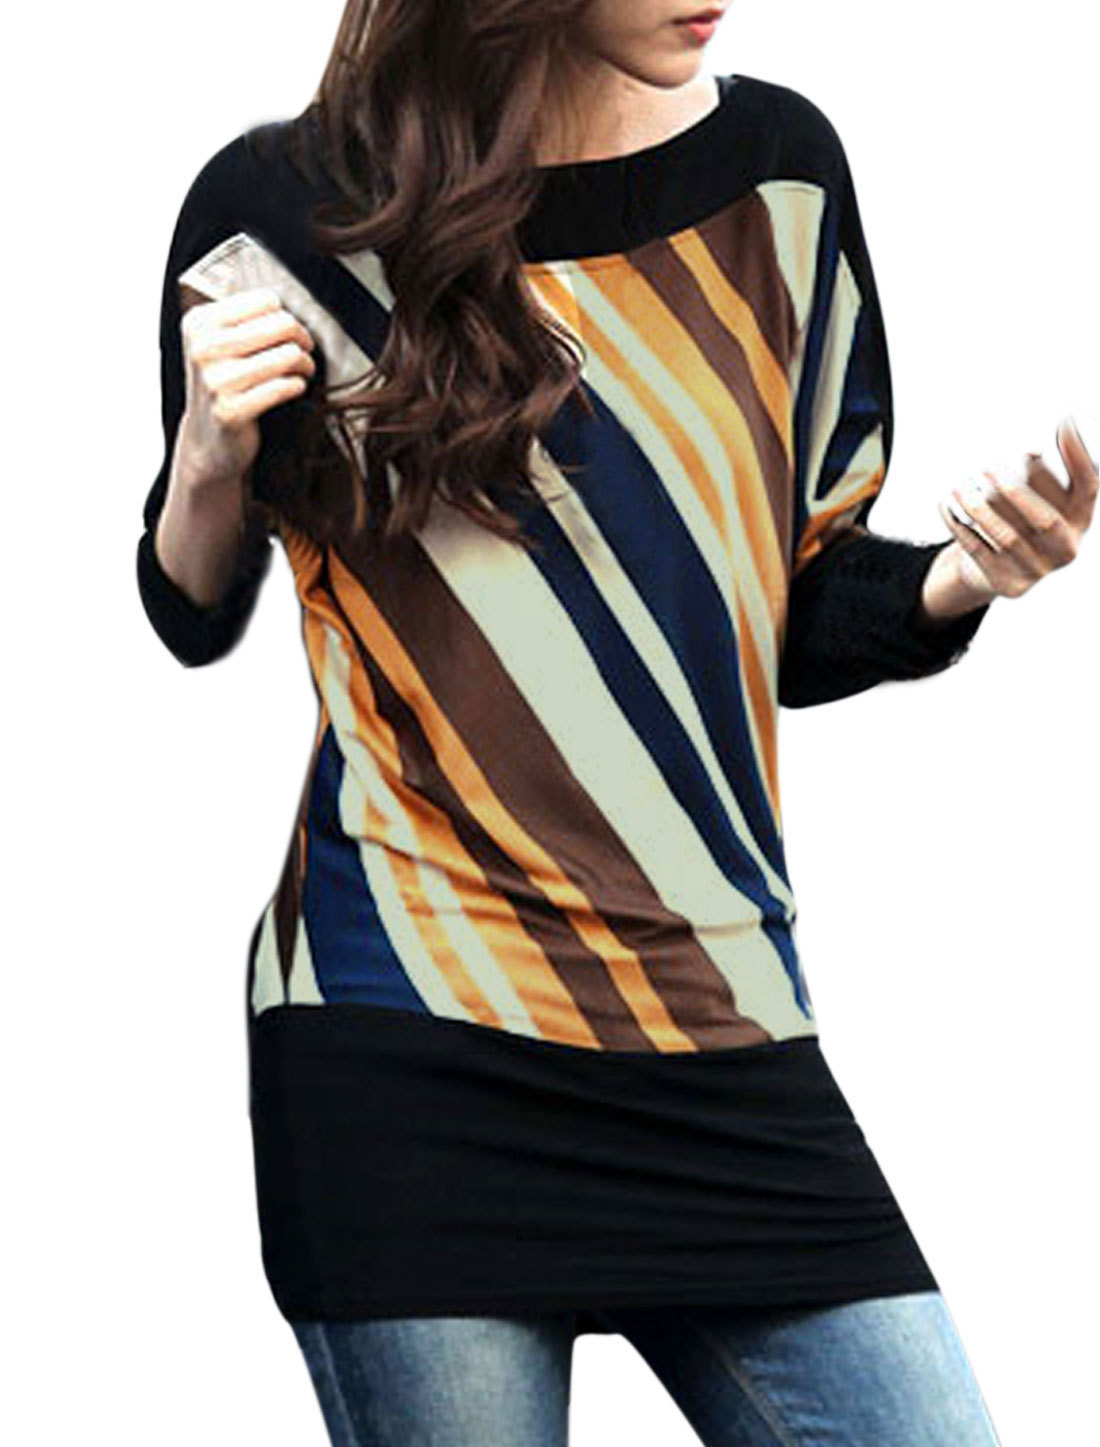 Lady Asymmetric Neck Stripes Pattern Panel Casual Top Multicolor S